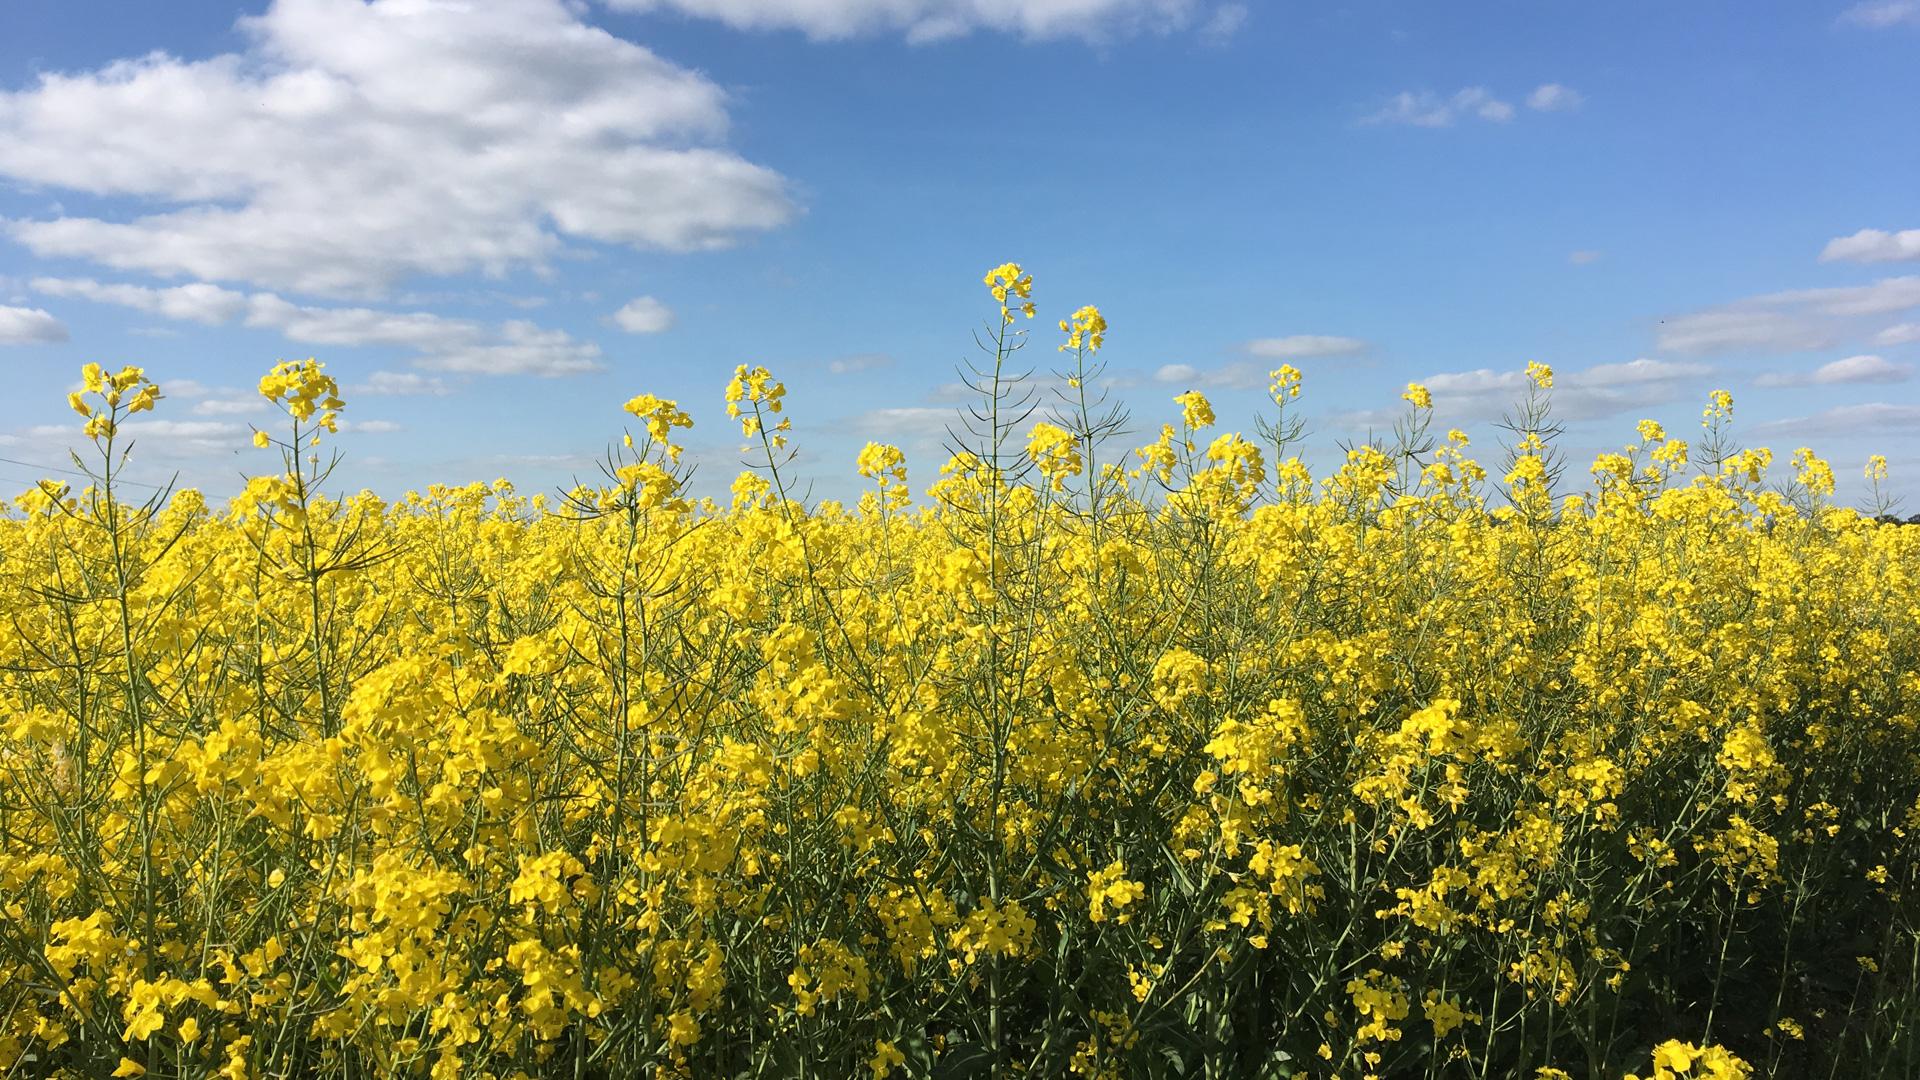 Le Champ de Colza - 菜の花畑